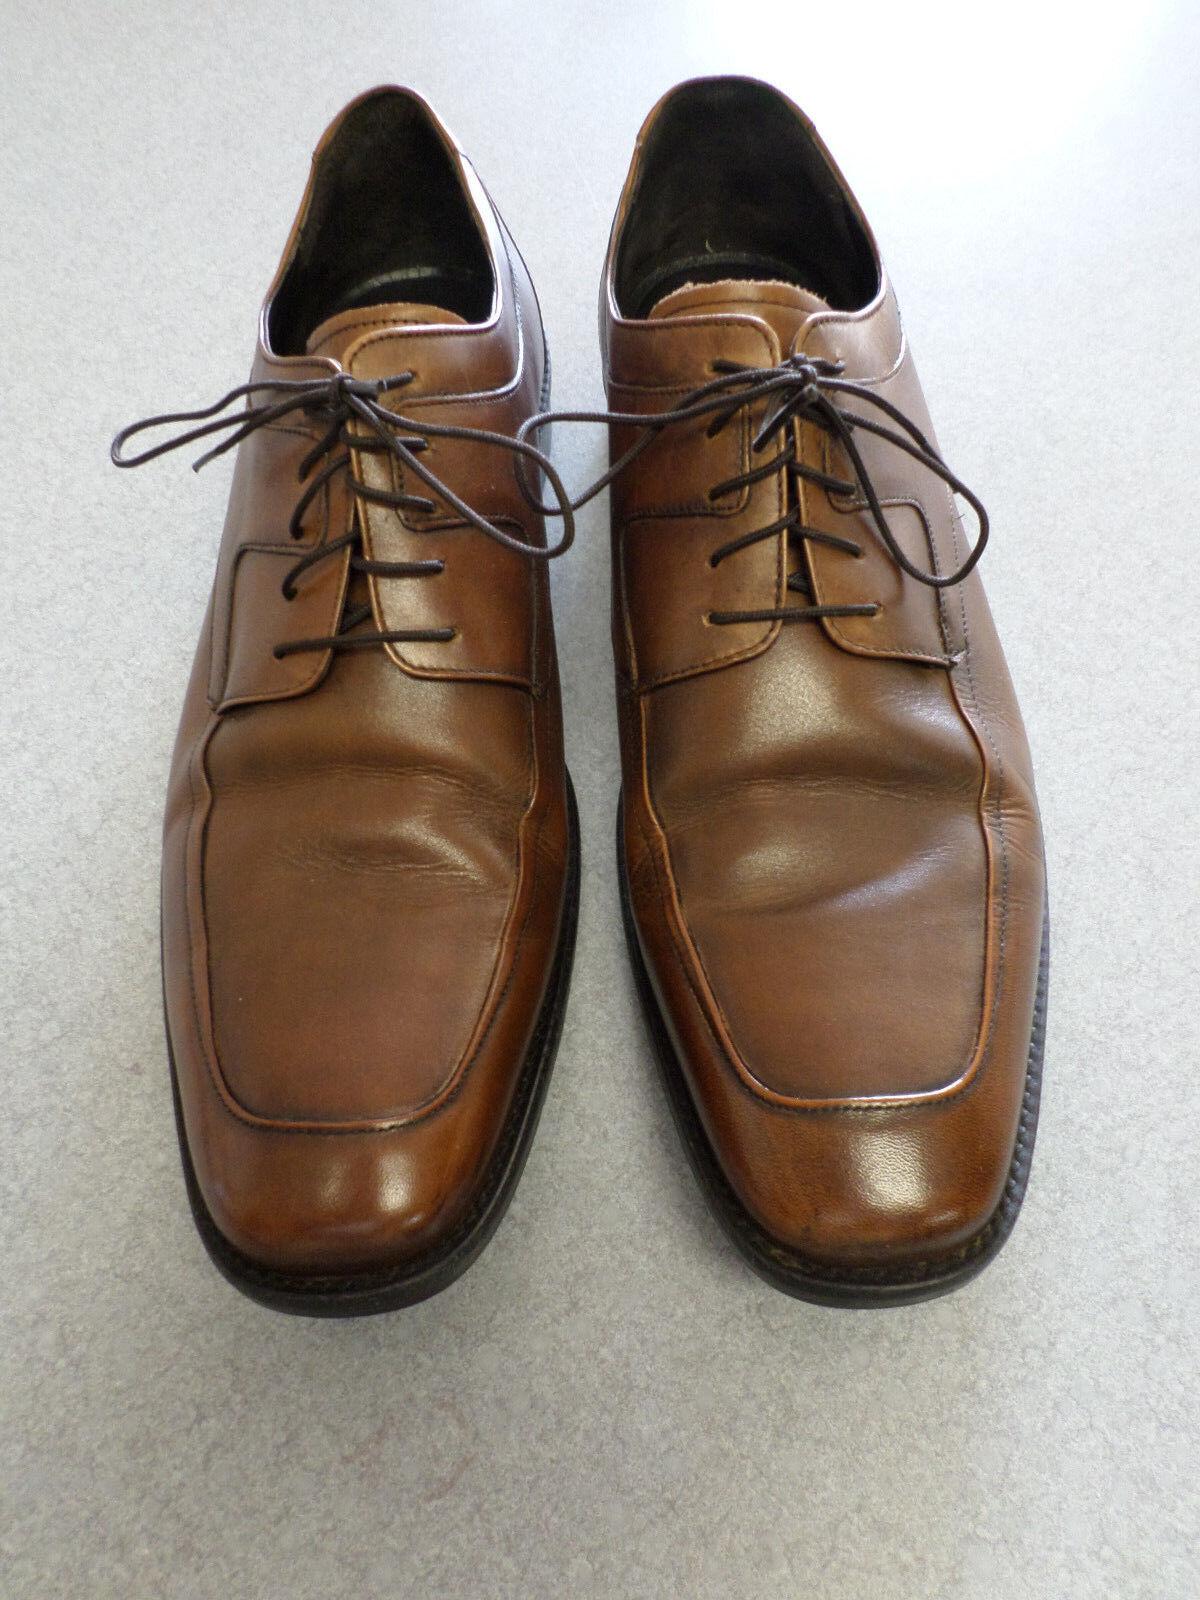 Johnston & Murphy walnut brown leather oxfords. Men's 13 M